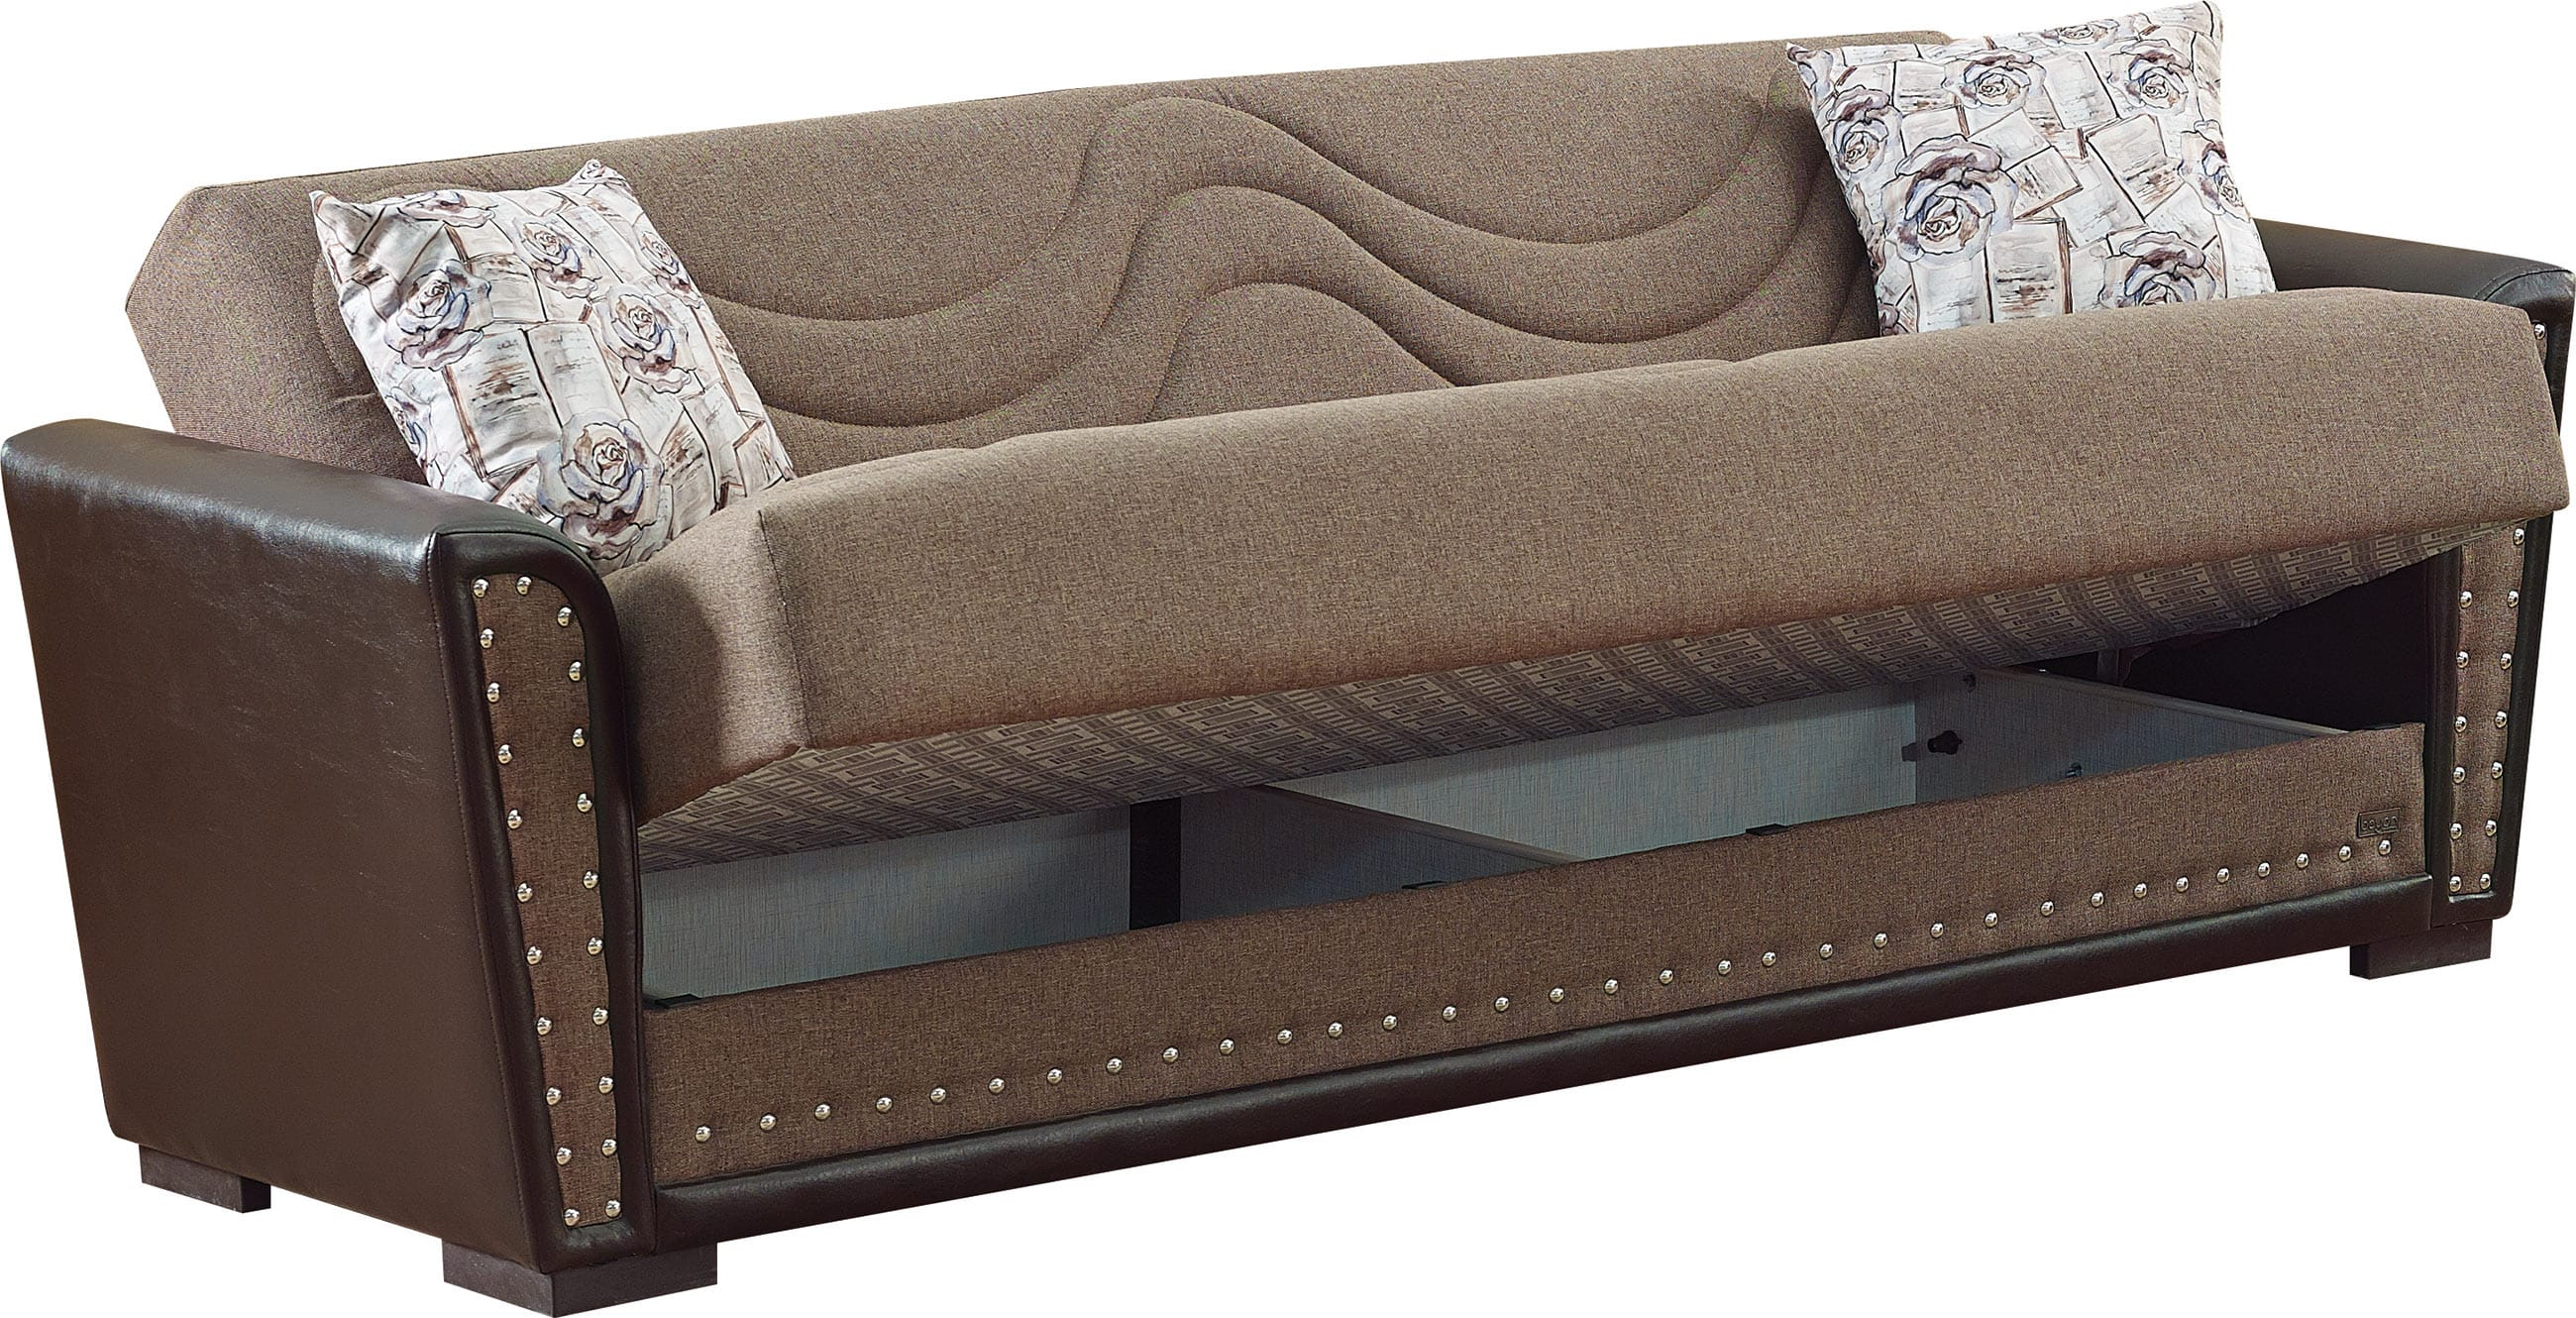 Sofa bed furniture toronto sofa menzilperde net for Sofa bed toronto